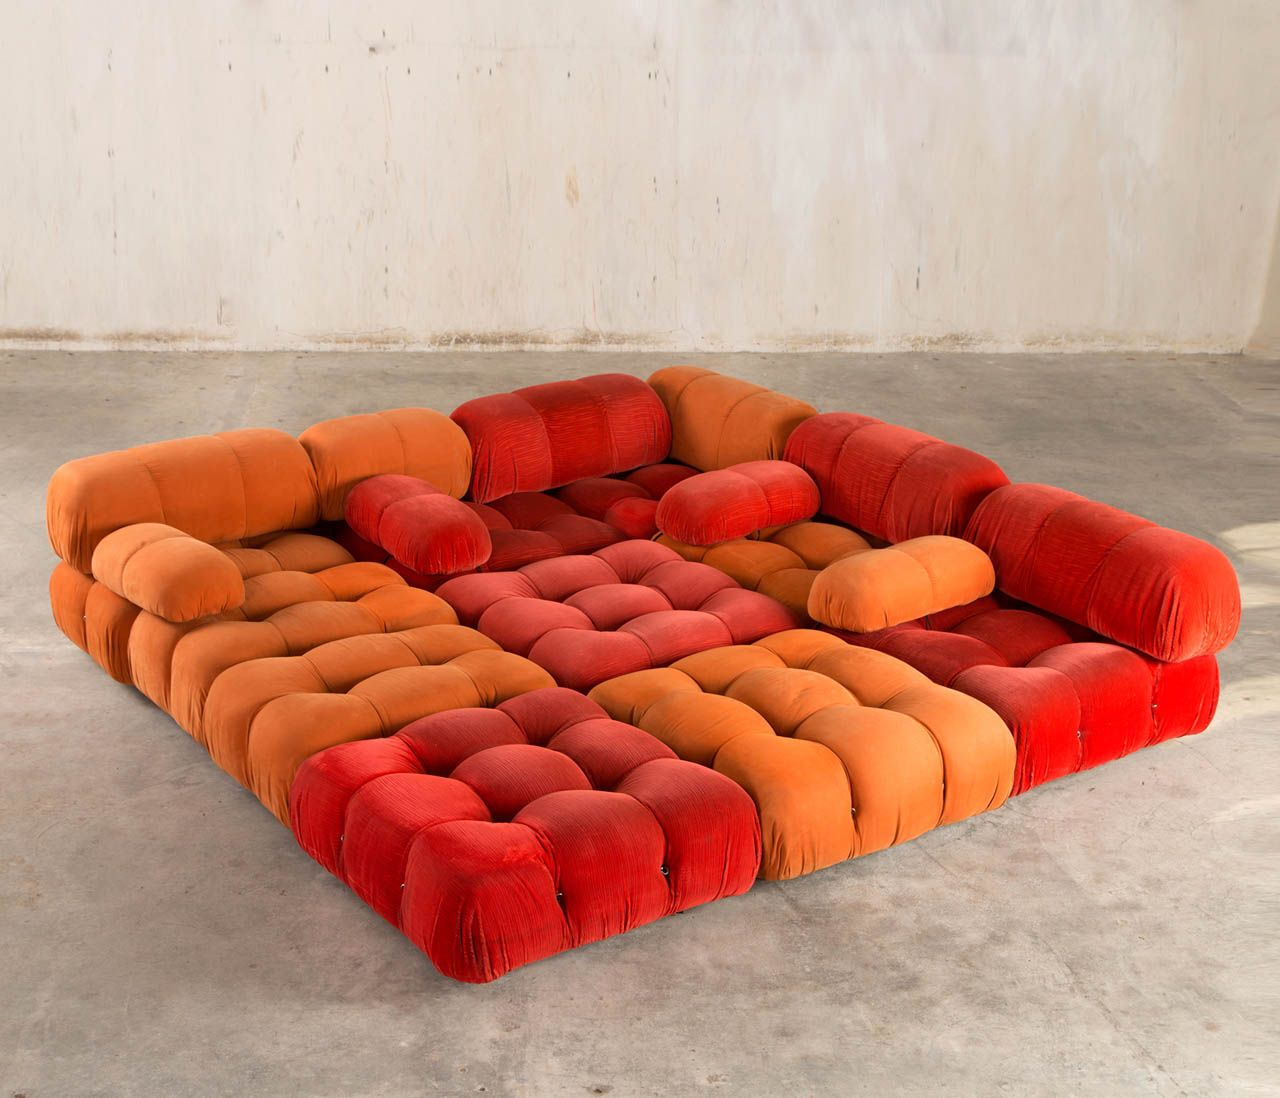 Marvelous Camaleonda Modular Sofa By Mario Bellini For Cb Italia Creativecarmelina Interior Chair Design Creativecarmelinacom